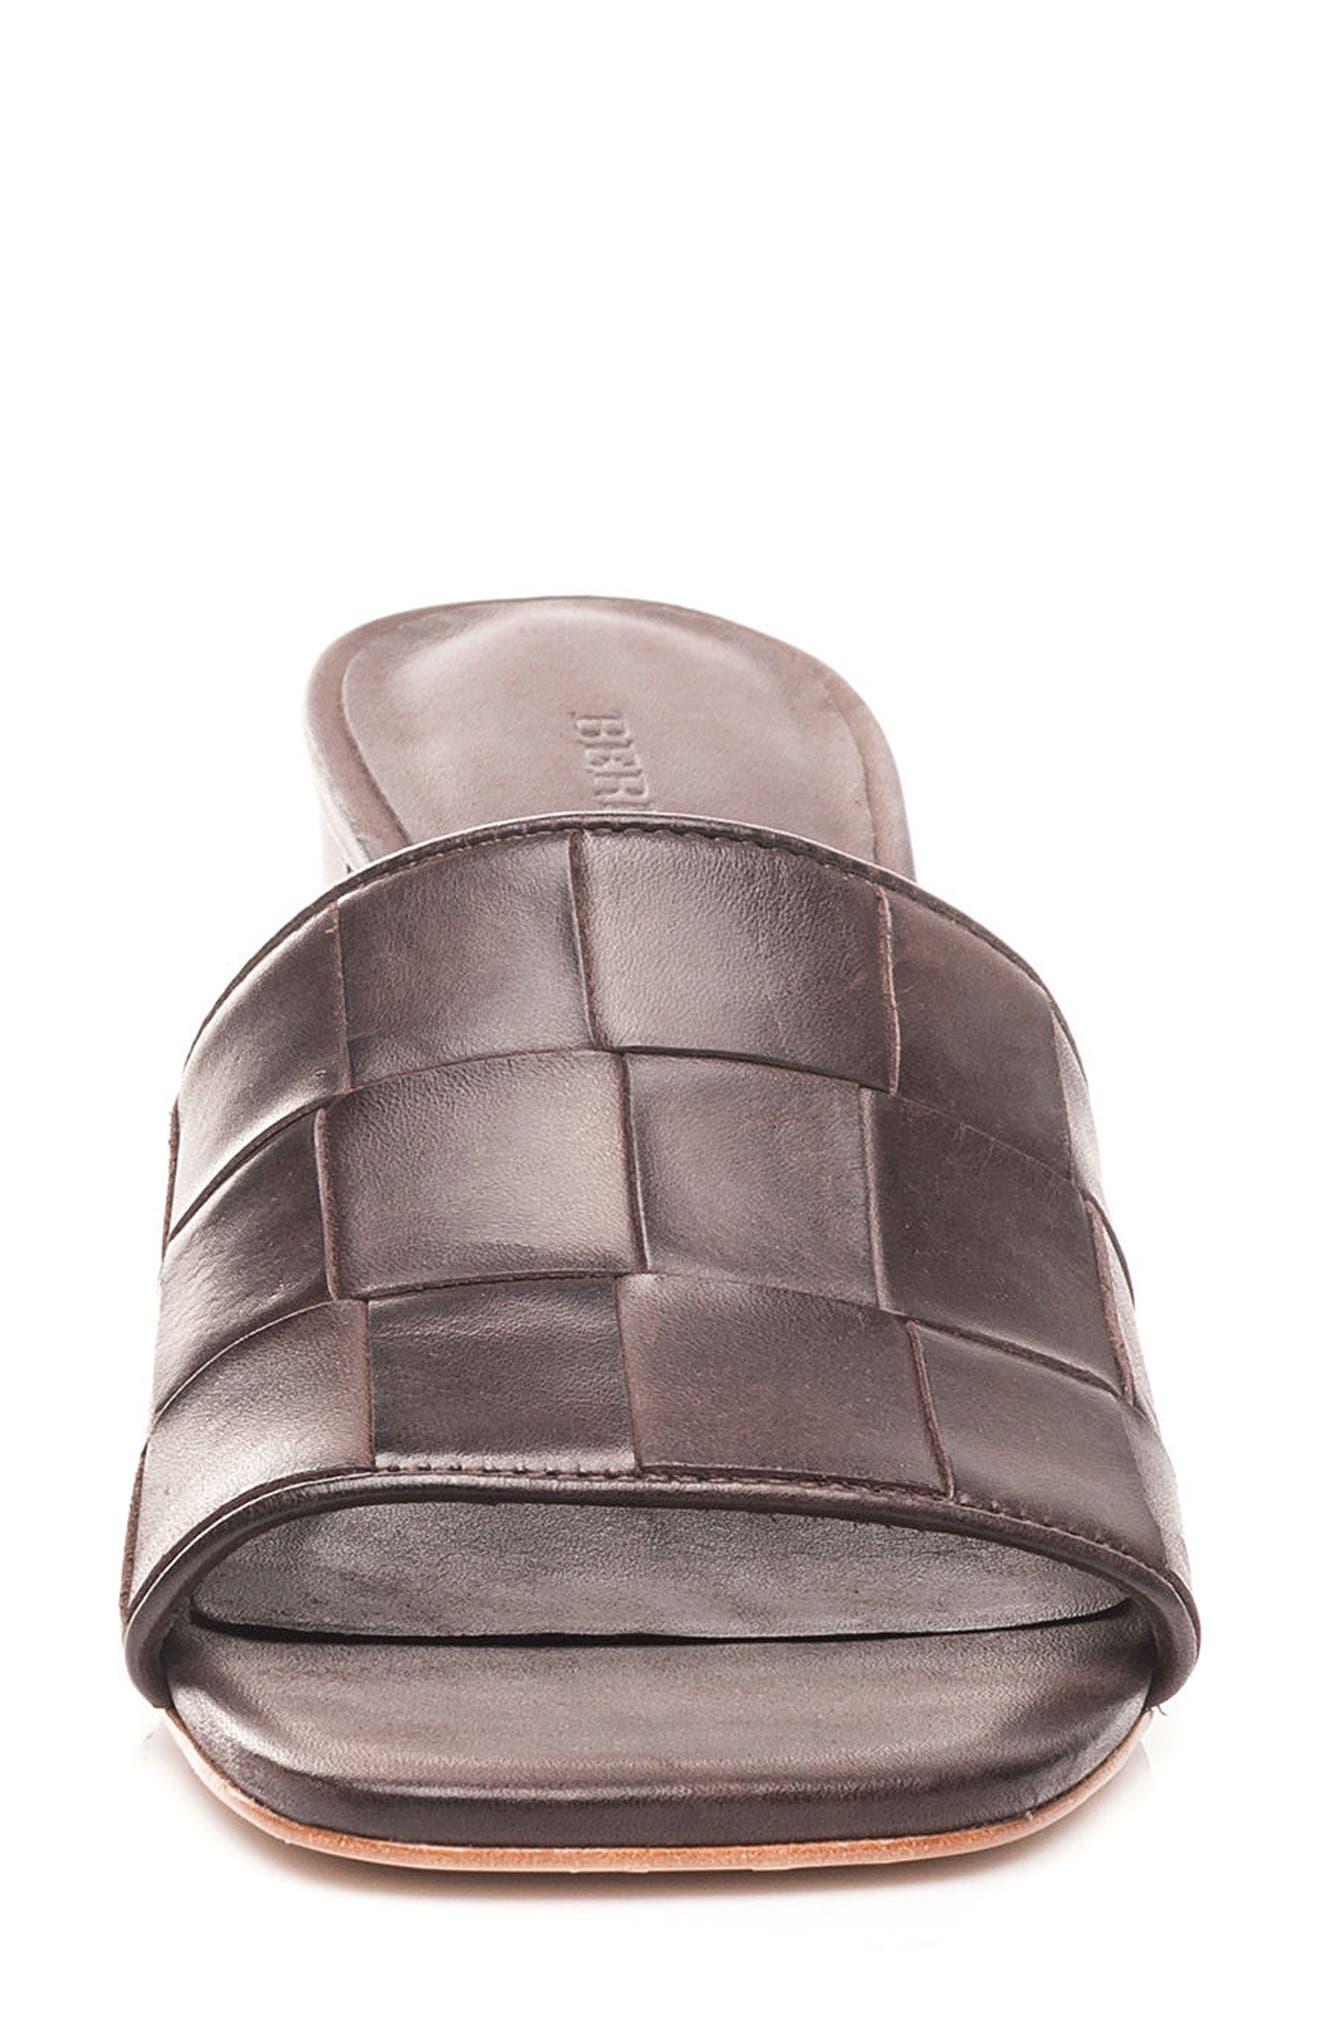 Bernardo Bridget Block Heel Sandal,                             Alternate thumbnail 15, color,